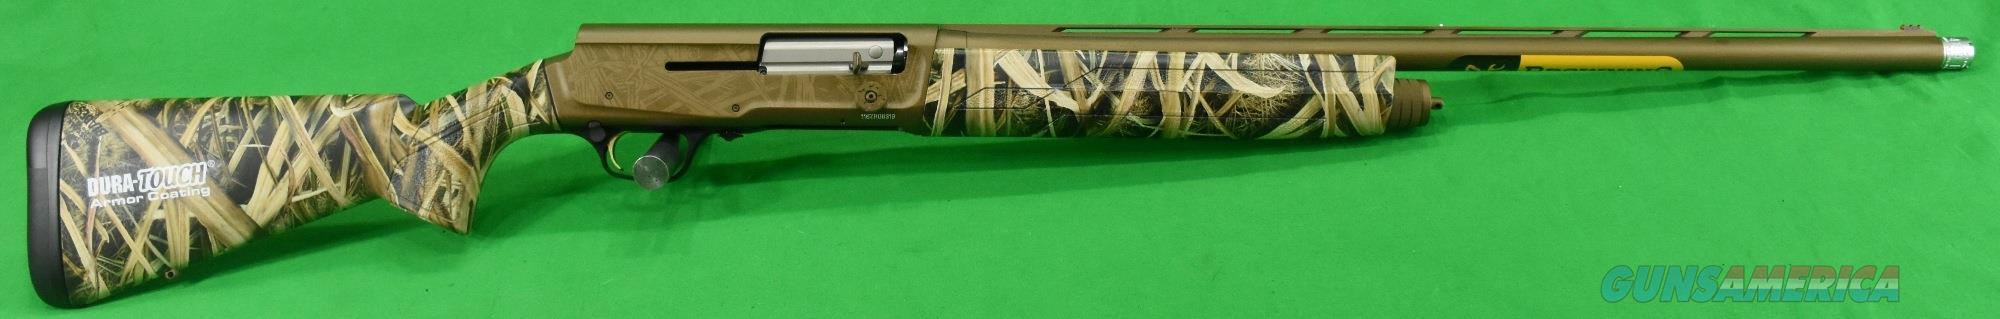 0118412005 Browning A5 Wicked Wing Blades Camo 12 Ga 26-3.5In  Guns > Shotguns > Browning Shotguns > Autoloaders > Hunting